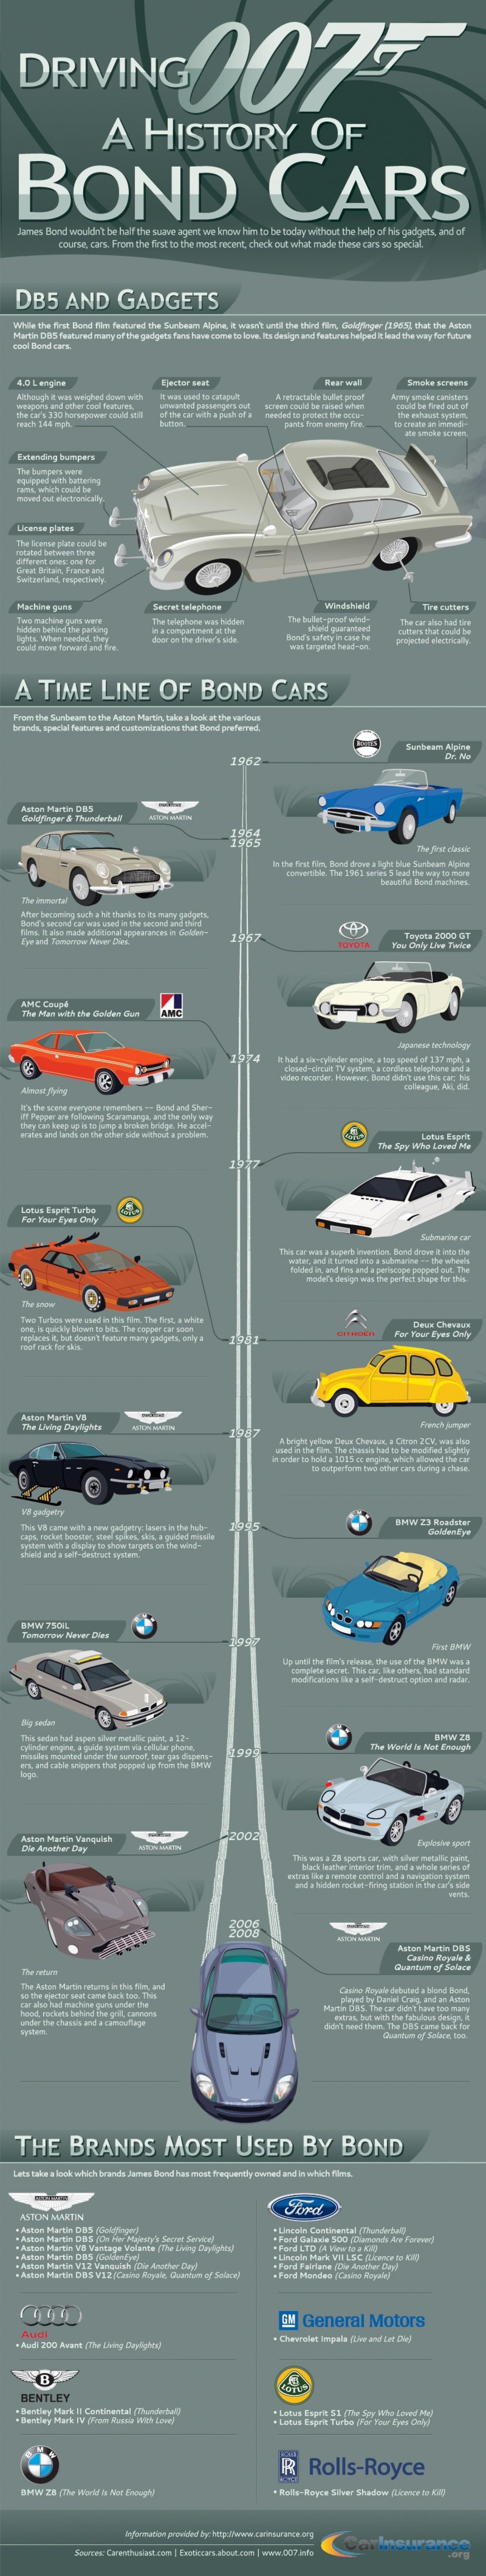 6. A history of James Bond cars